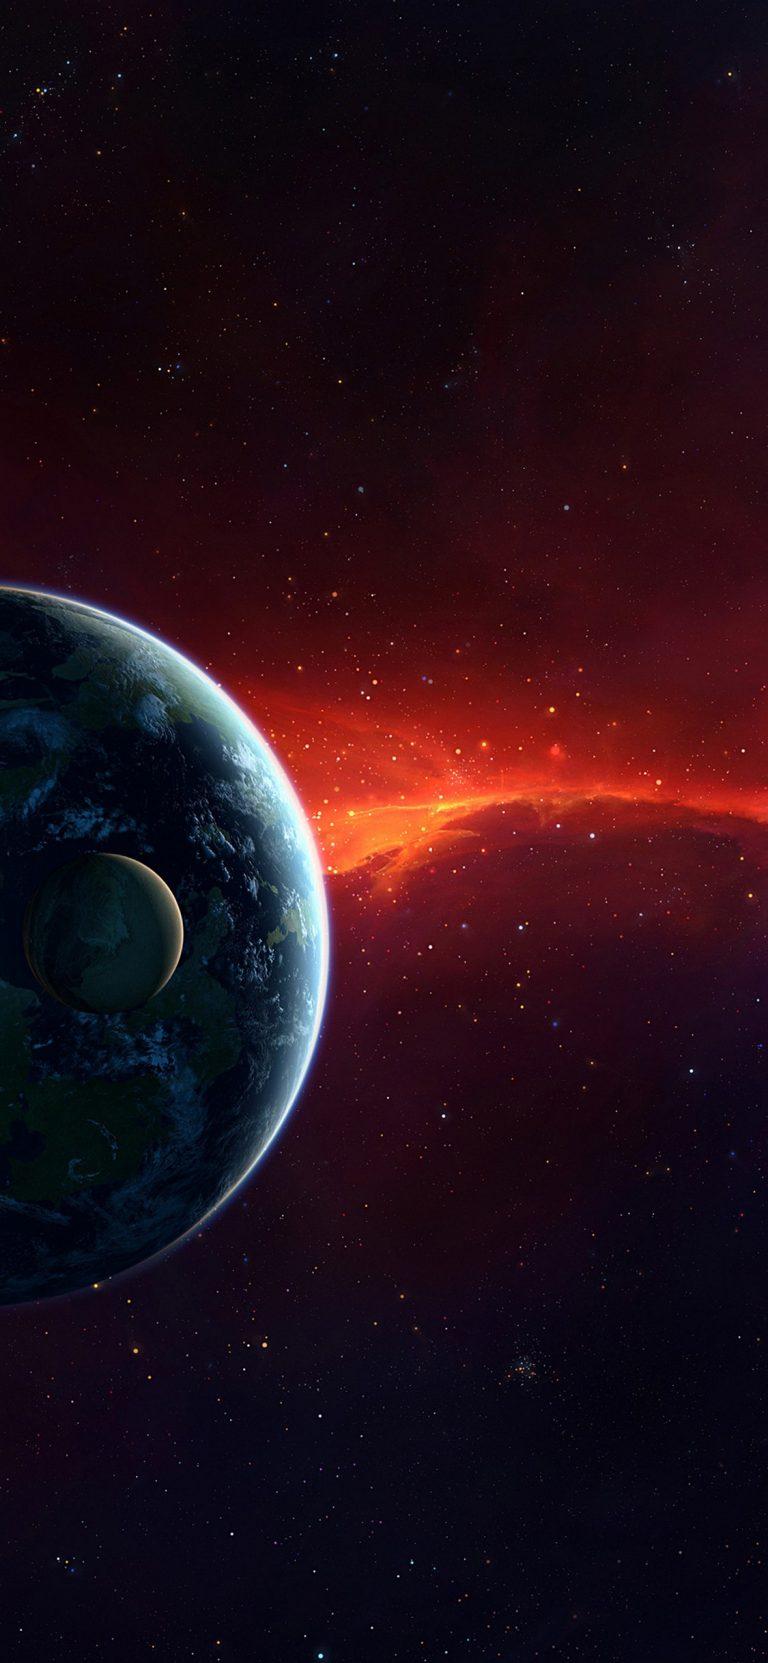 Planets HD Wallpaper 1125x2436 768x1663